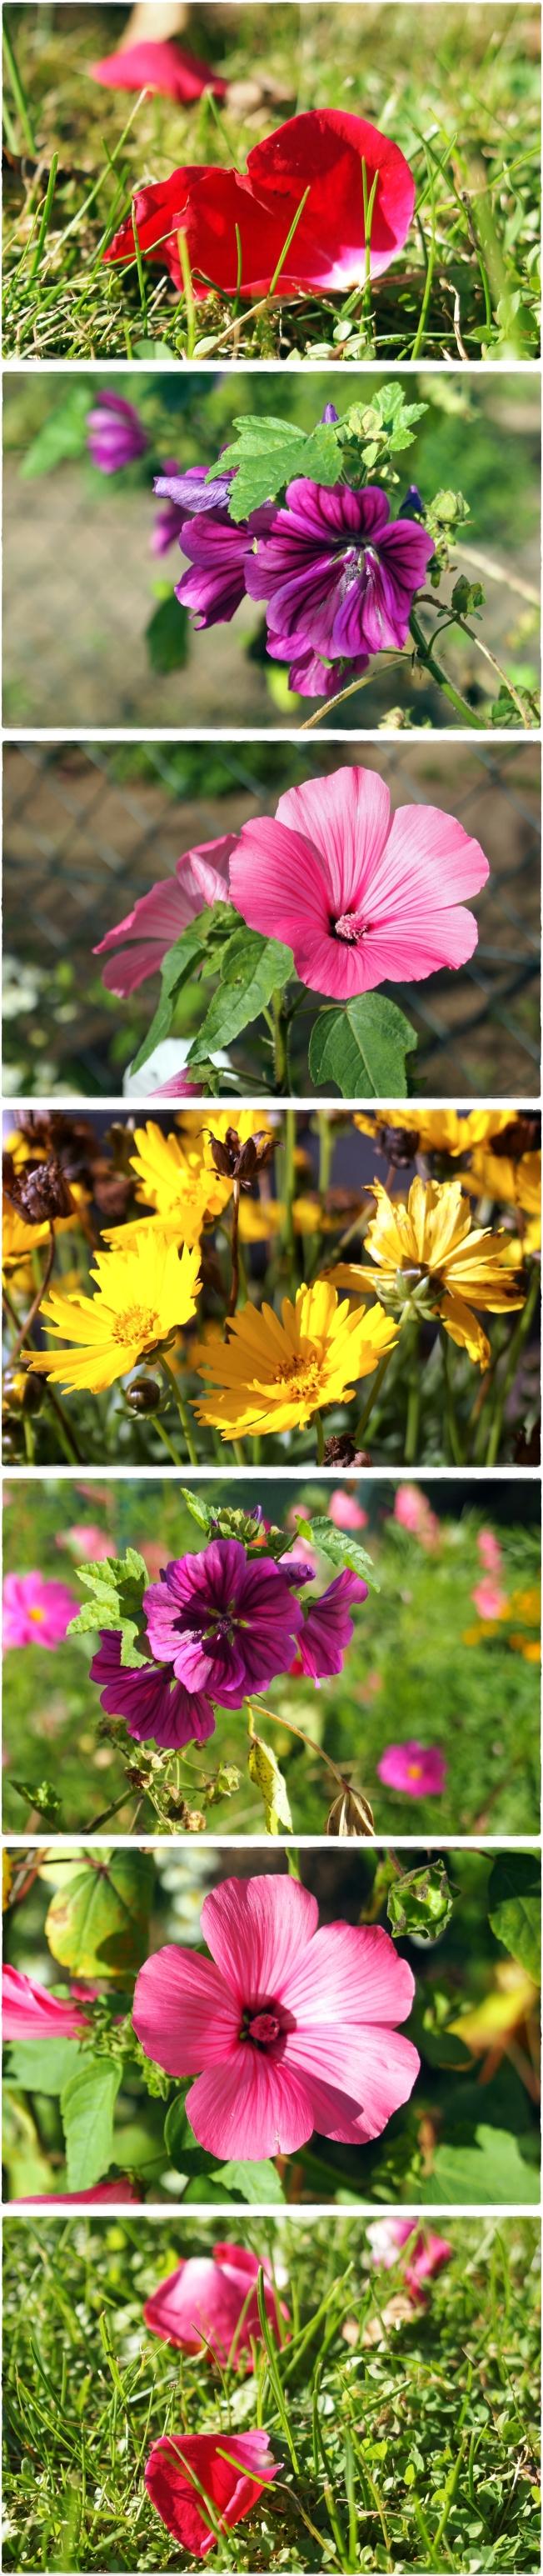 Flowerspam